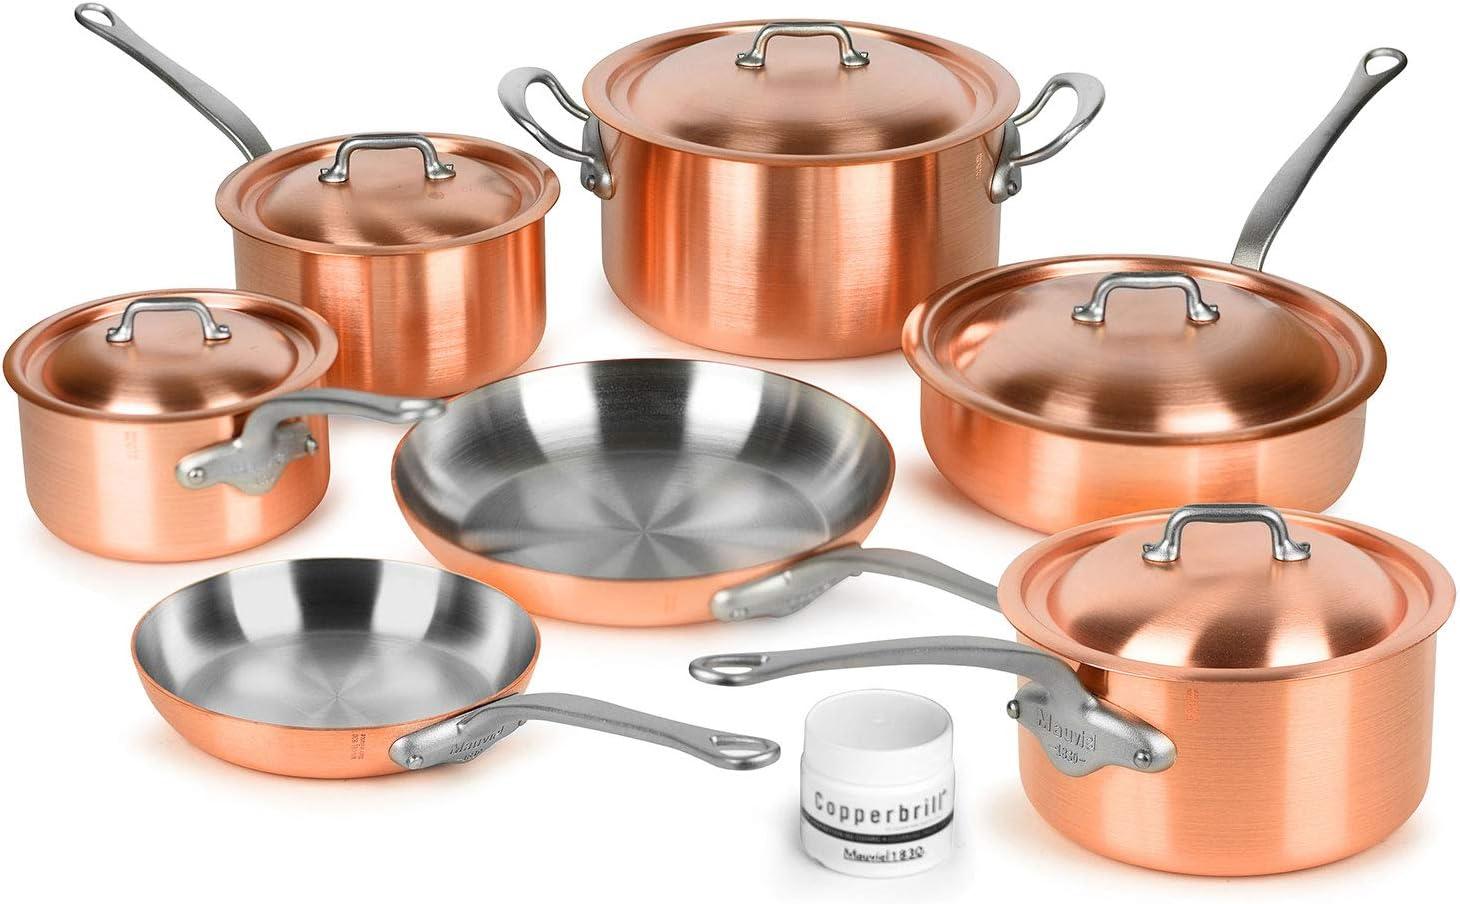 Mauviel M250B Copper Saucepan 12,5 x 12 x 13 cm copper copper